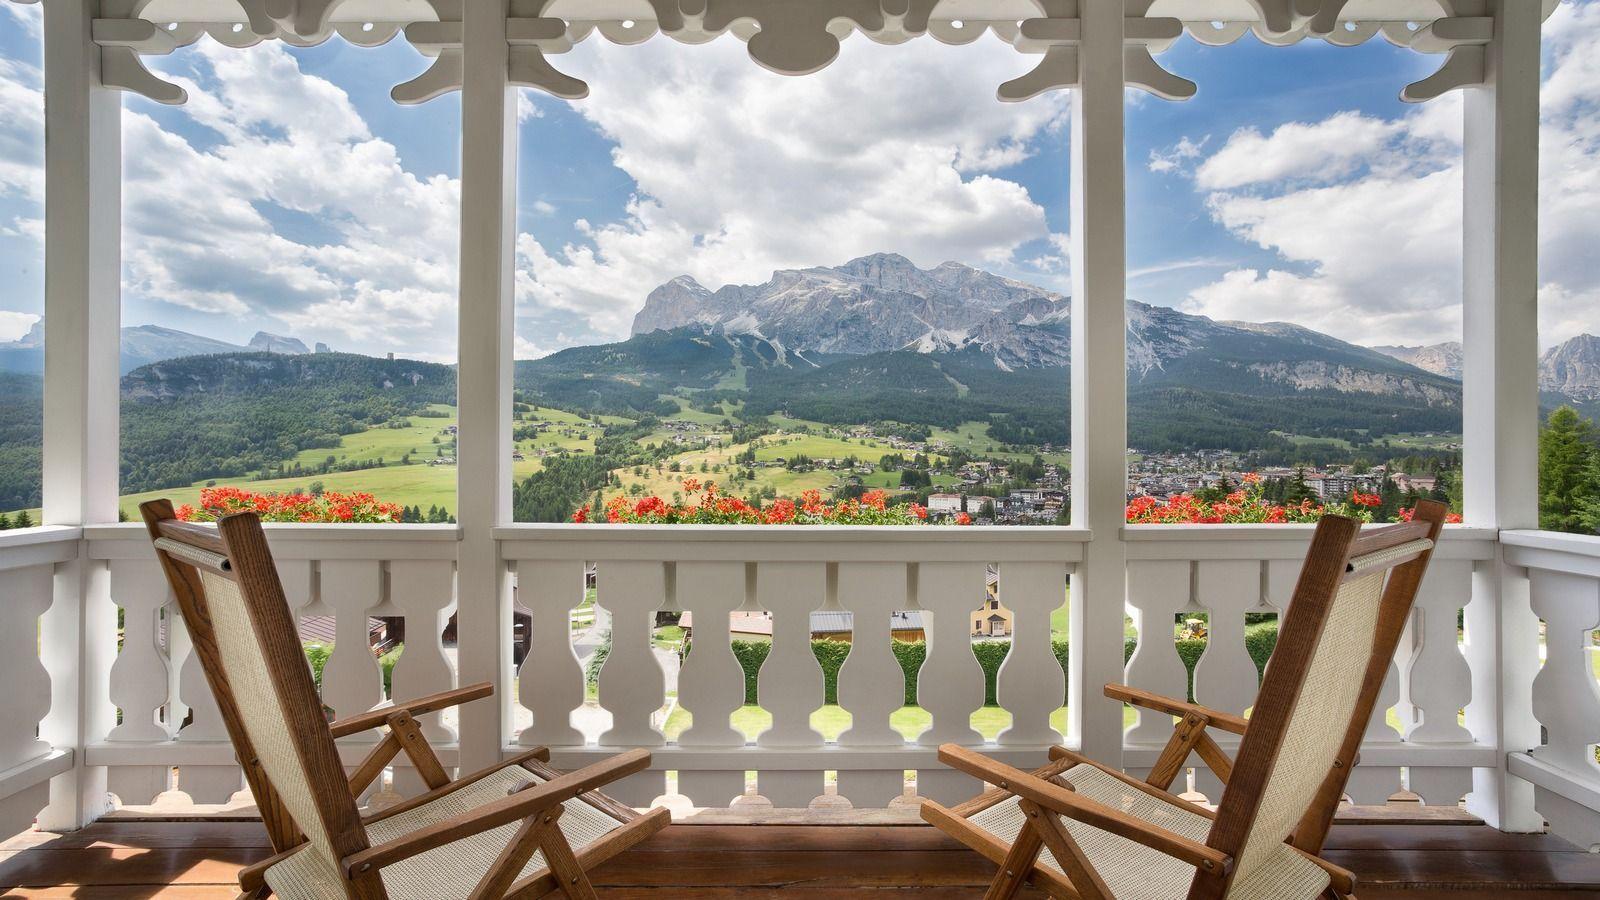 Cristallo , Luxury Collection Resort & Spa - Cortina d'Ampezzo / Italy